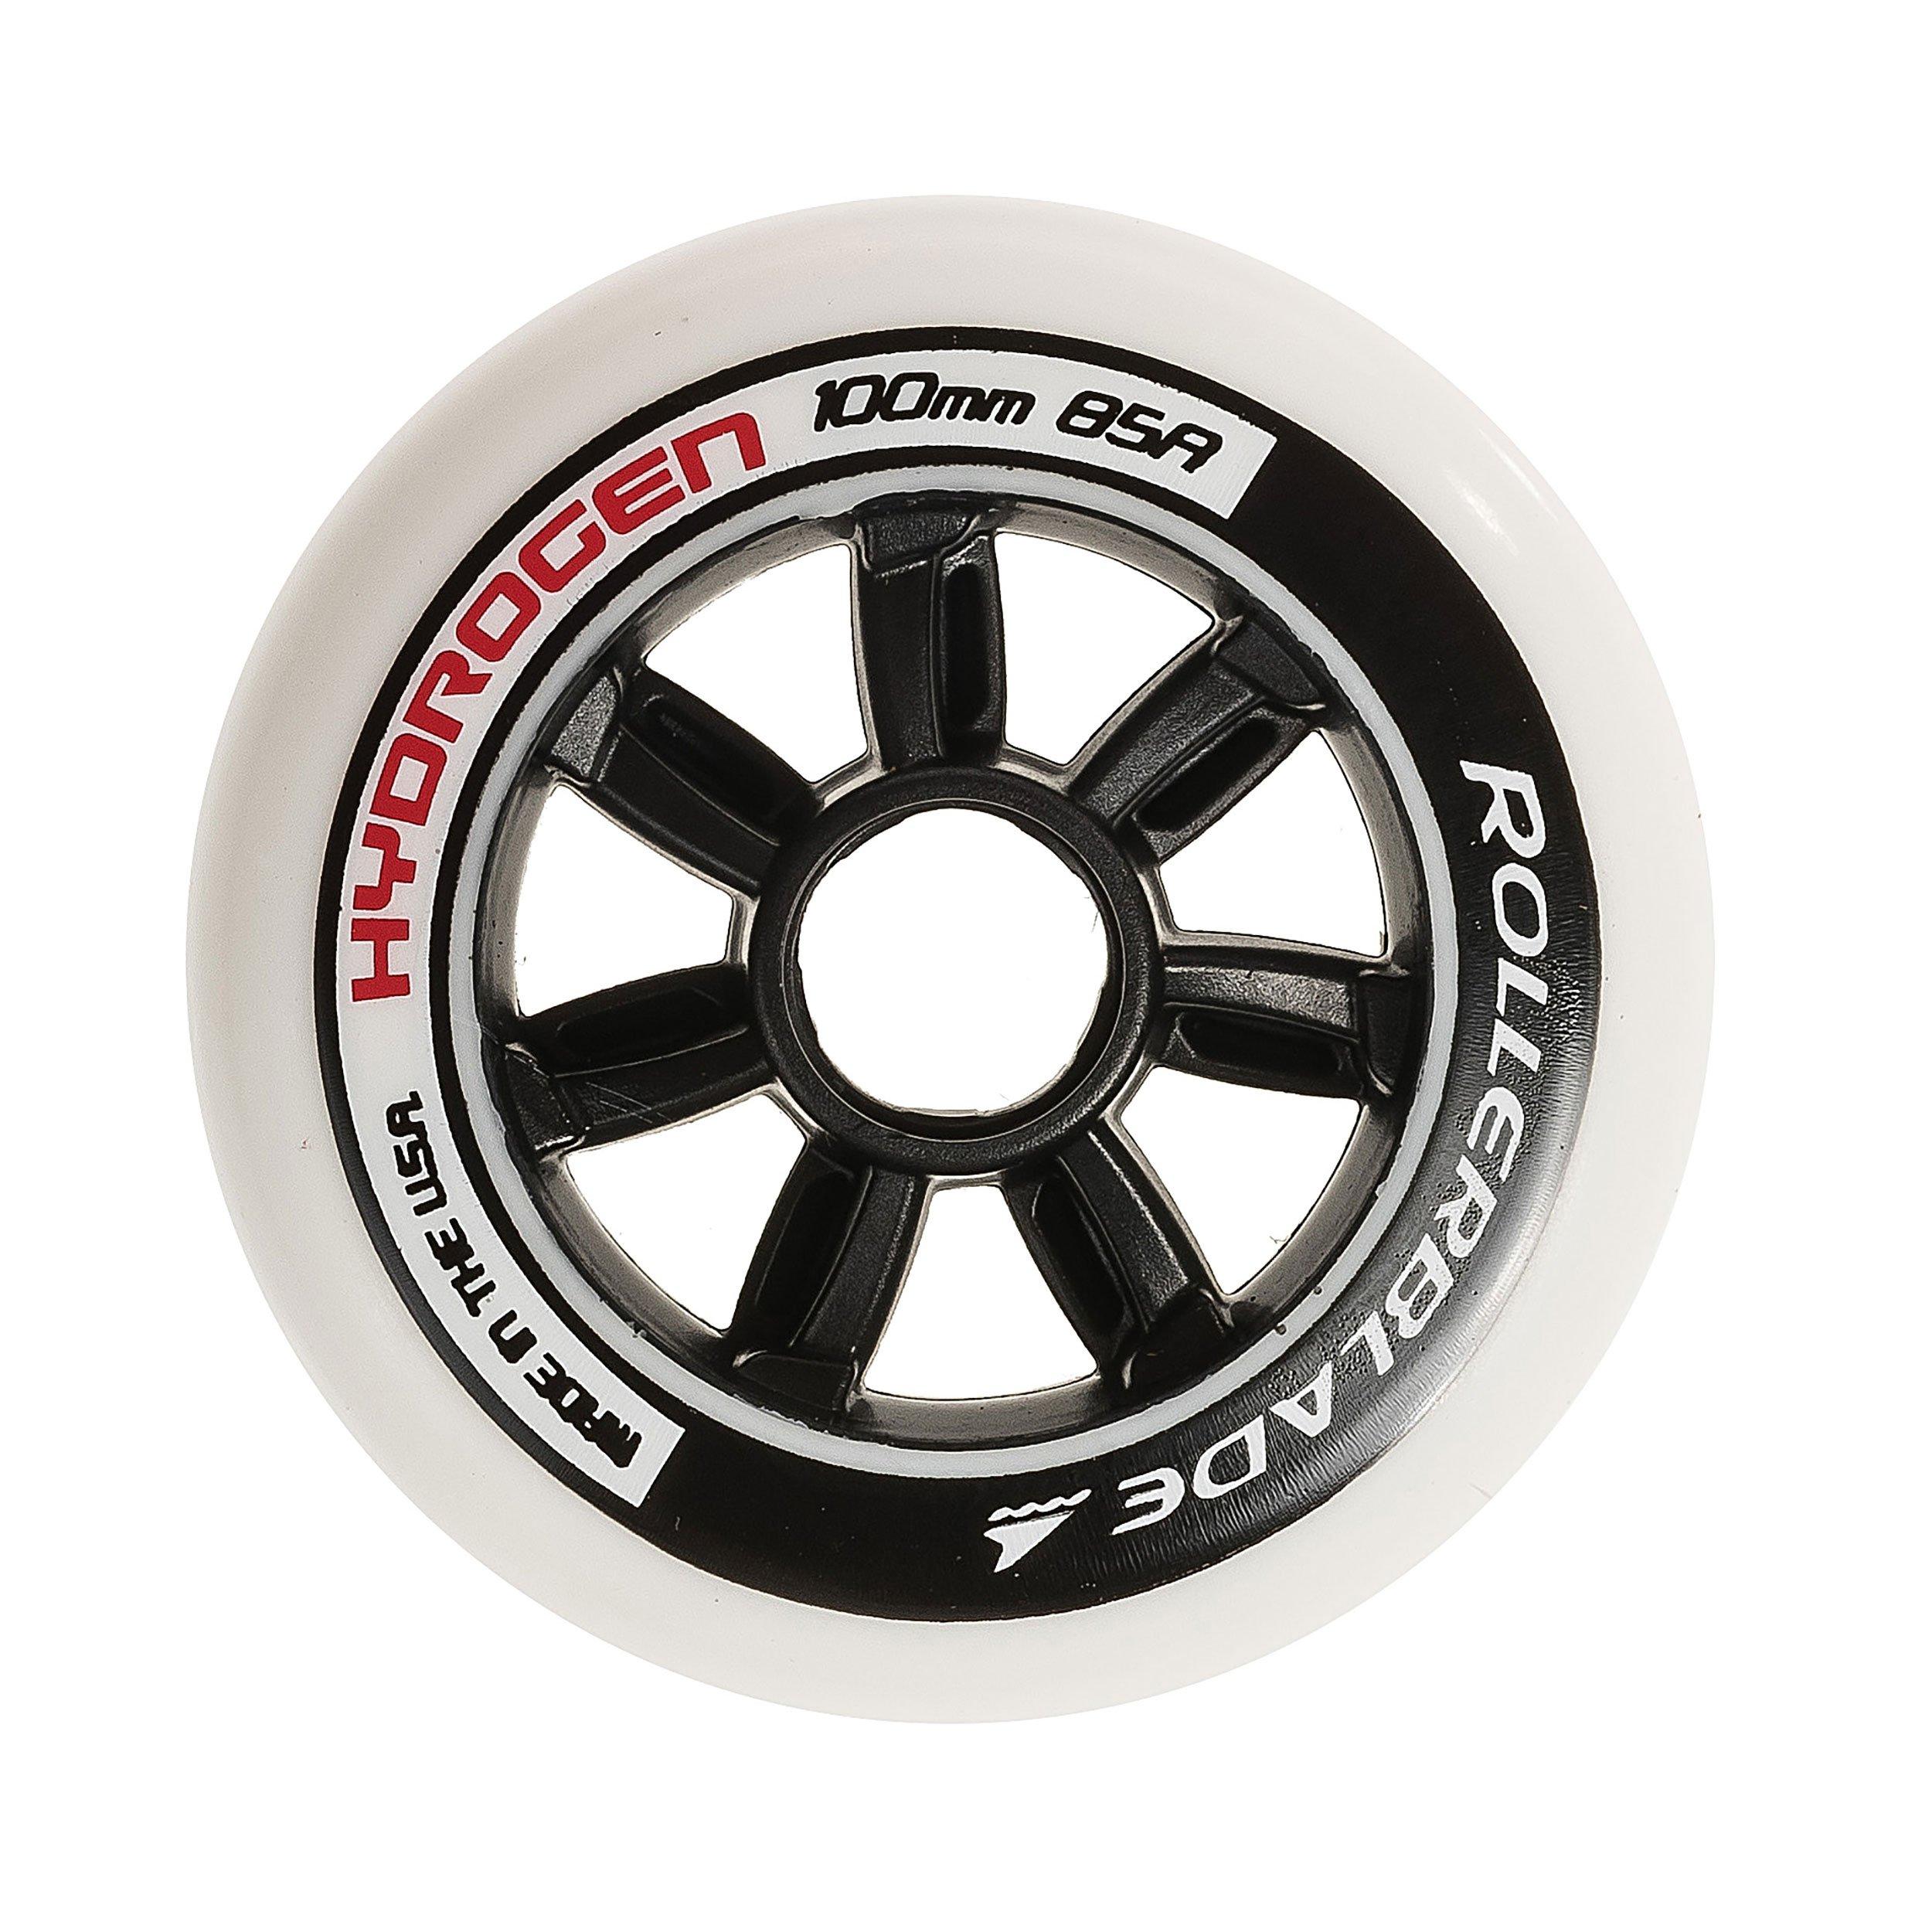 Rollerblade Hydrogen 100mm 85A Wheels, 8 Pack by Rollerblade